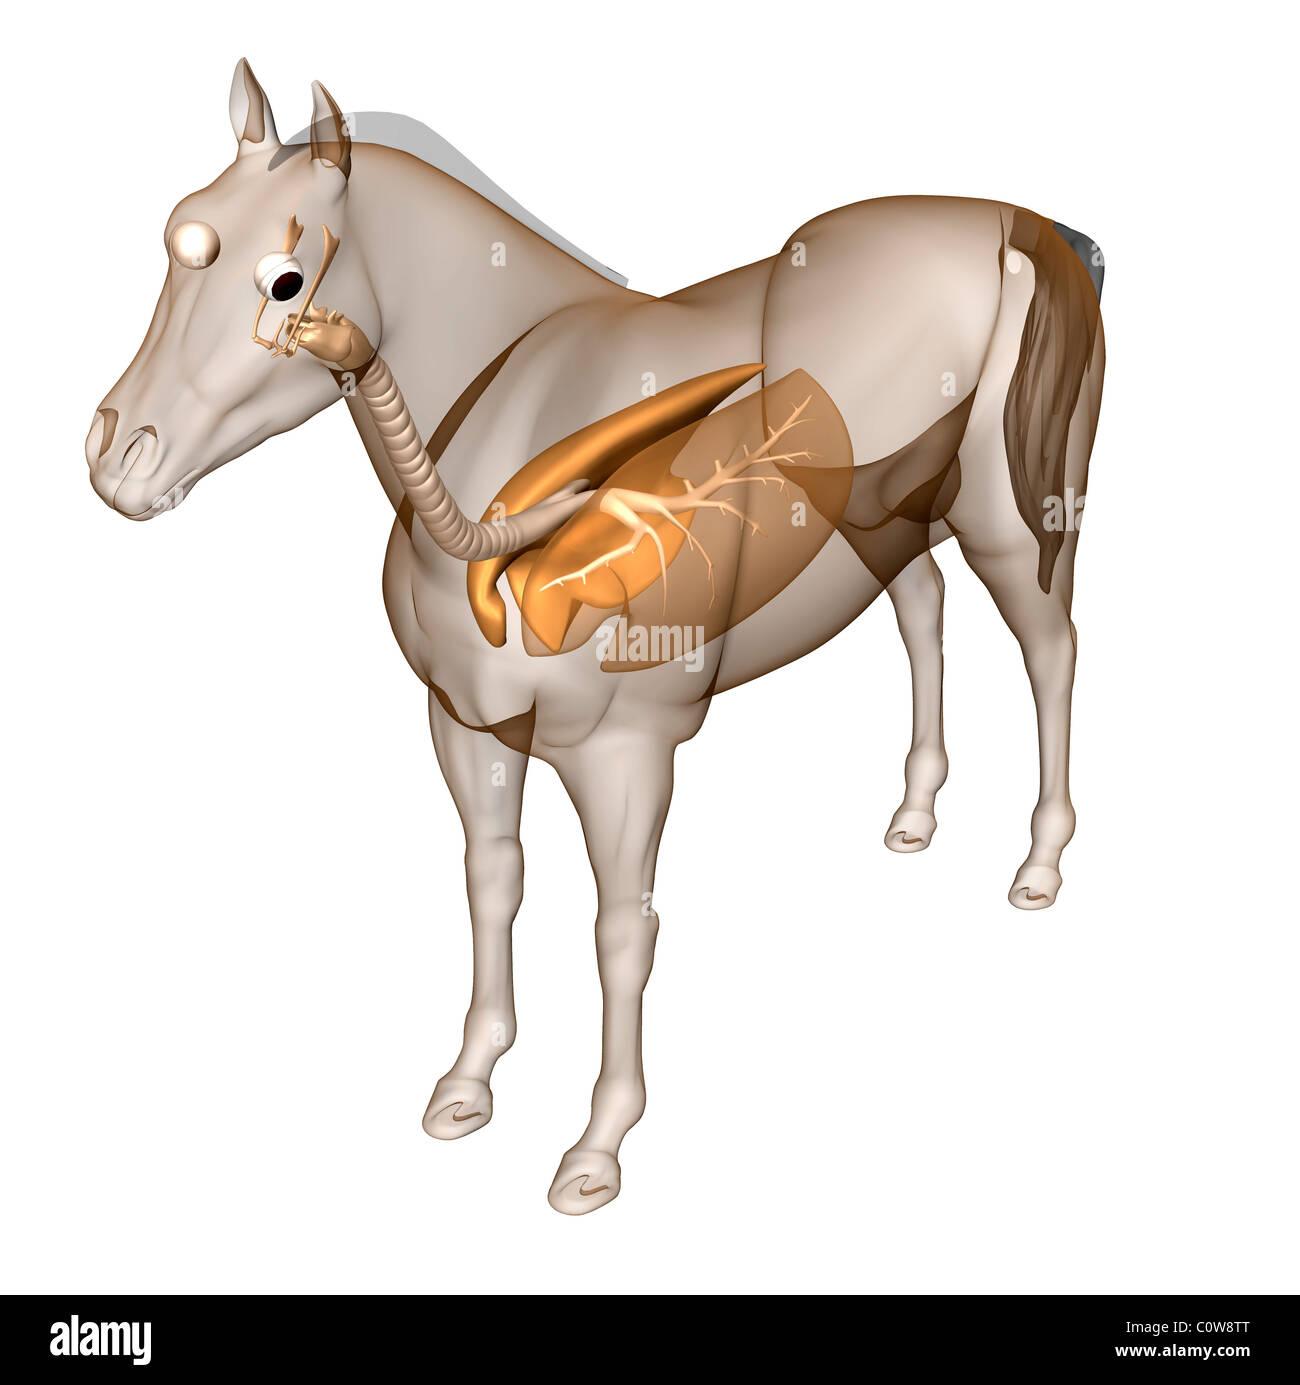 Pferd Anatomie Atemwege Lunge Stockfoto, Bild: 34976504 - Alamy